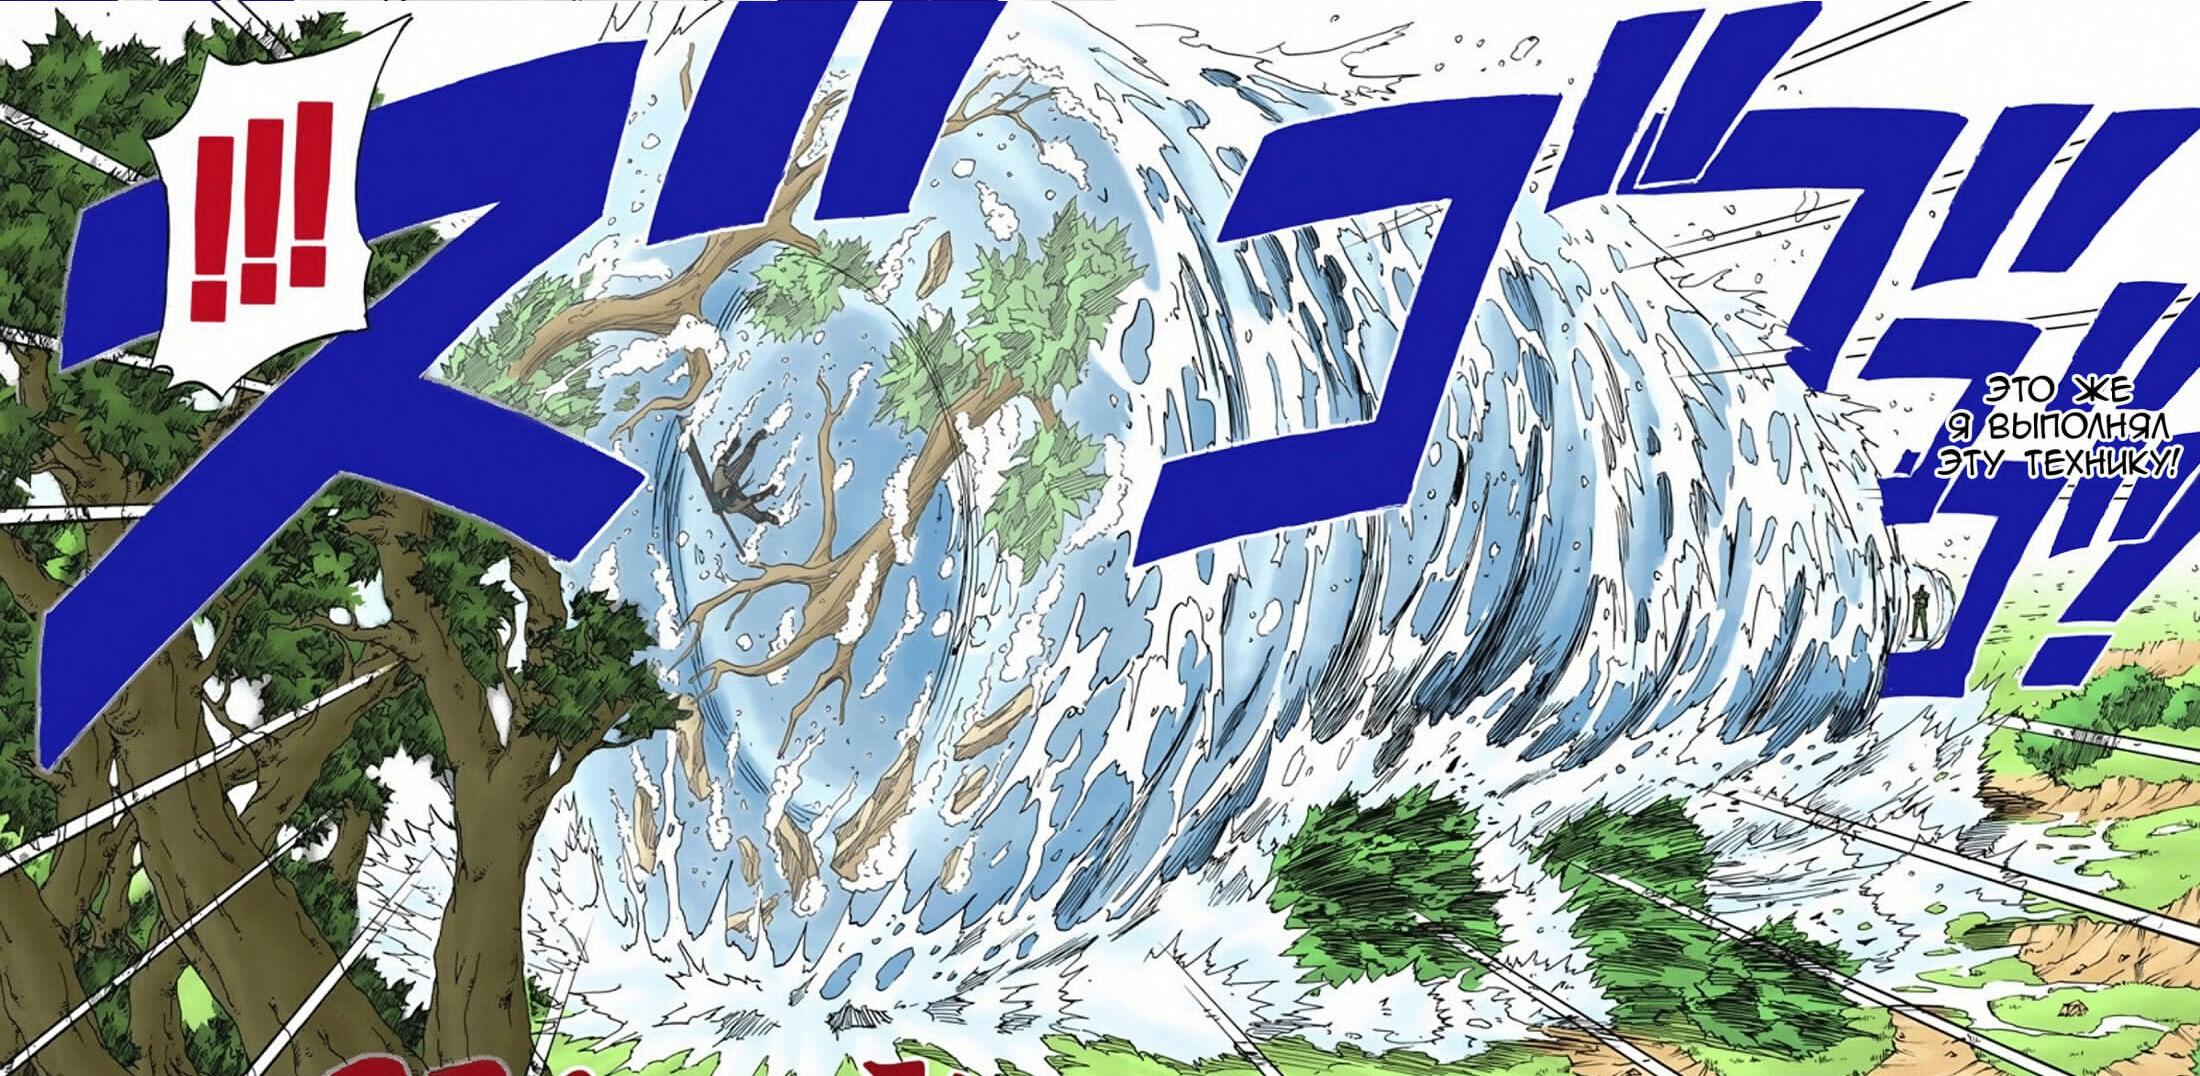 Itachi Uchiha vs Kakashi Hatake - Página 2 Cachoe10